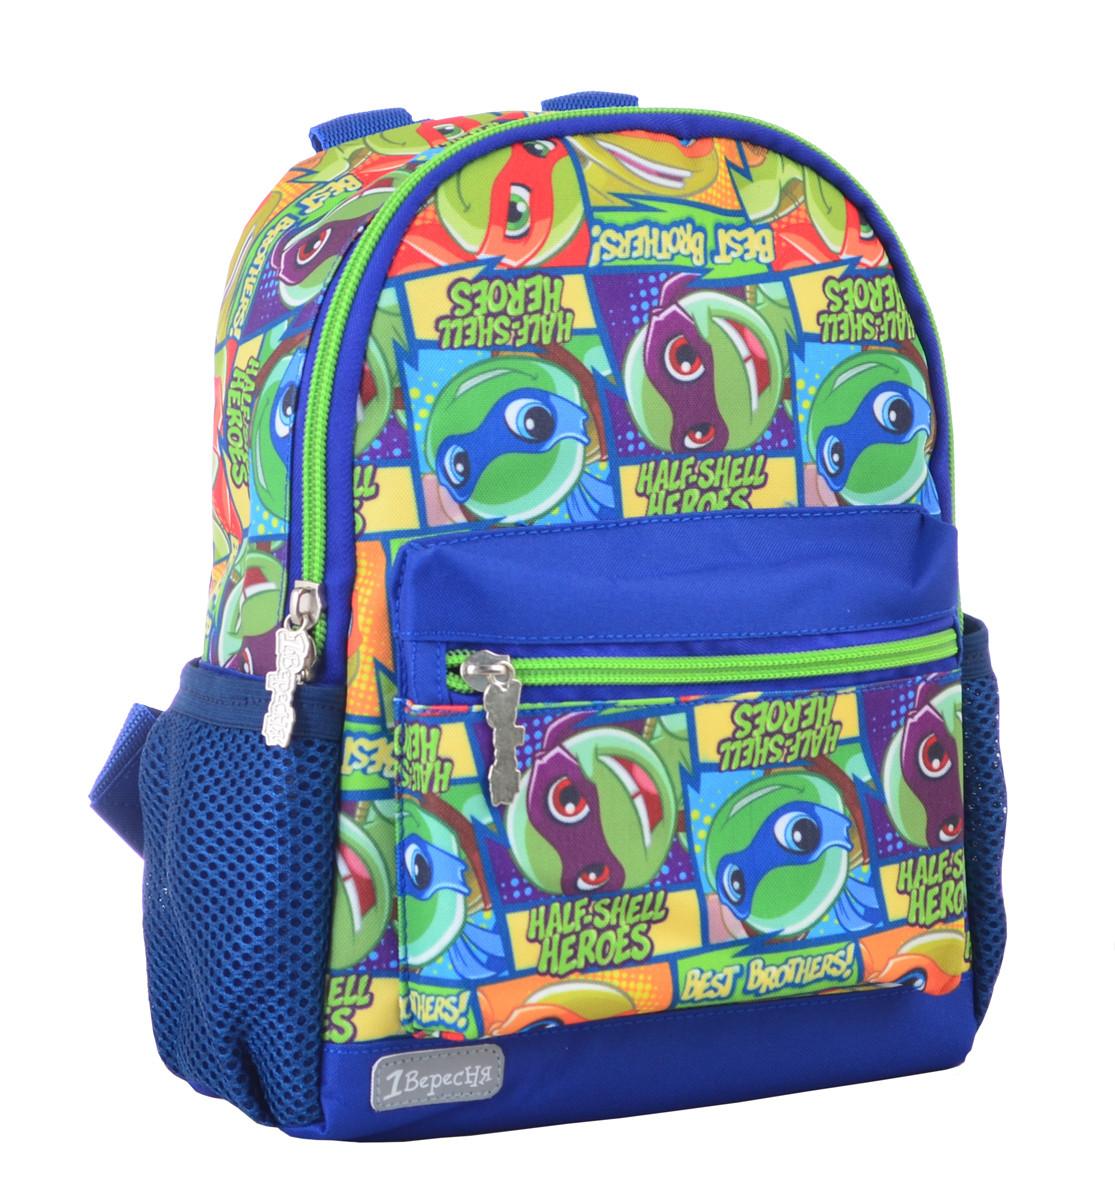 Рюкзак детский 1 Вересня K-16 Turtles, 22.5*18.5*9.5 554766